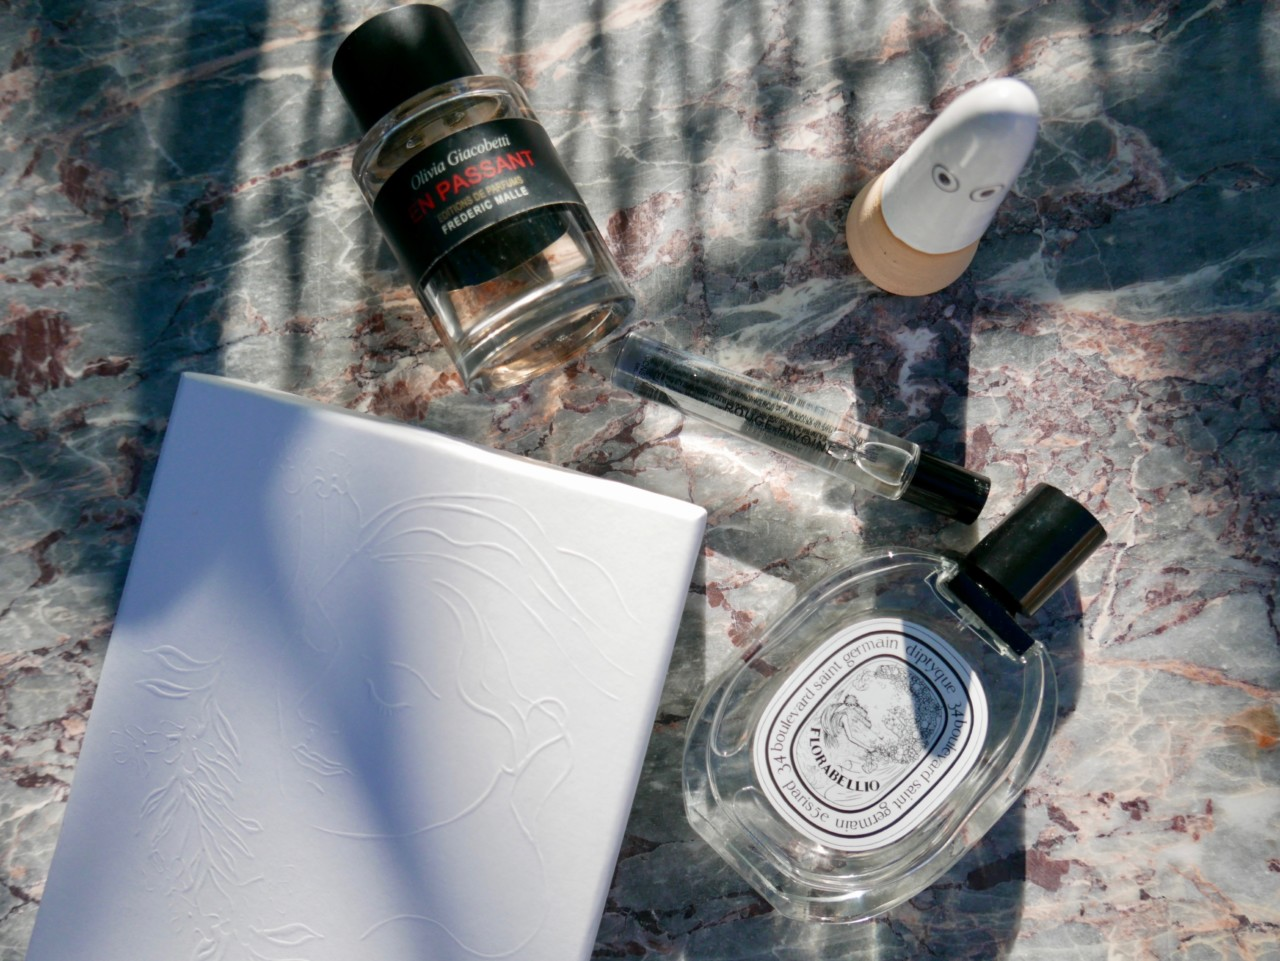 brukttips-sommer-dufter-malle-diptyque-marmorbord-finn-no-anja-stang